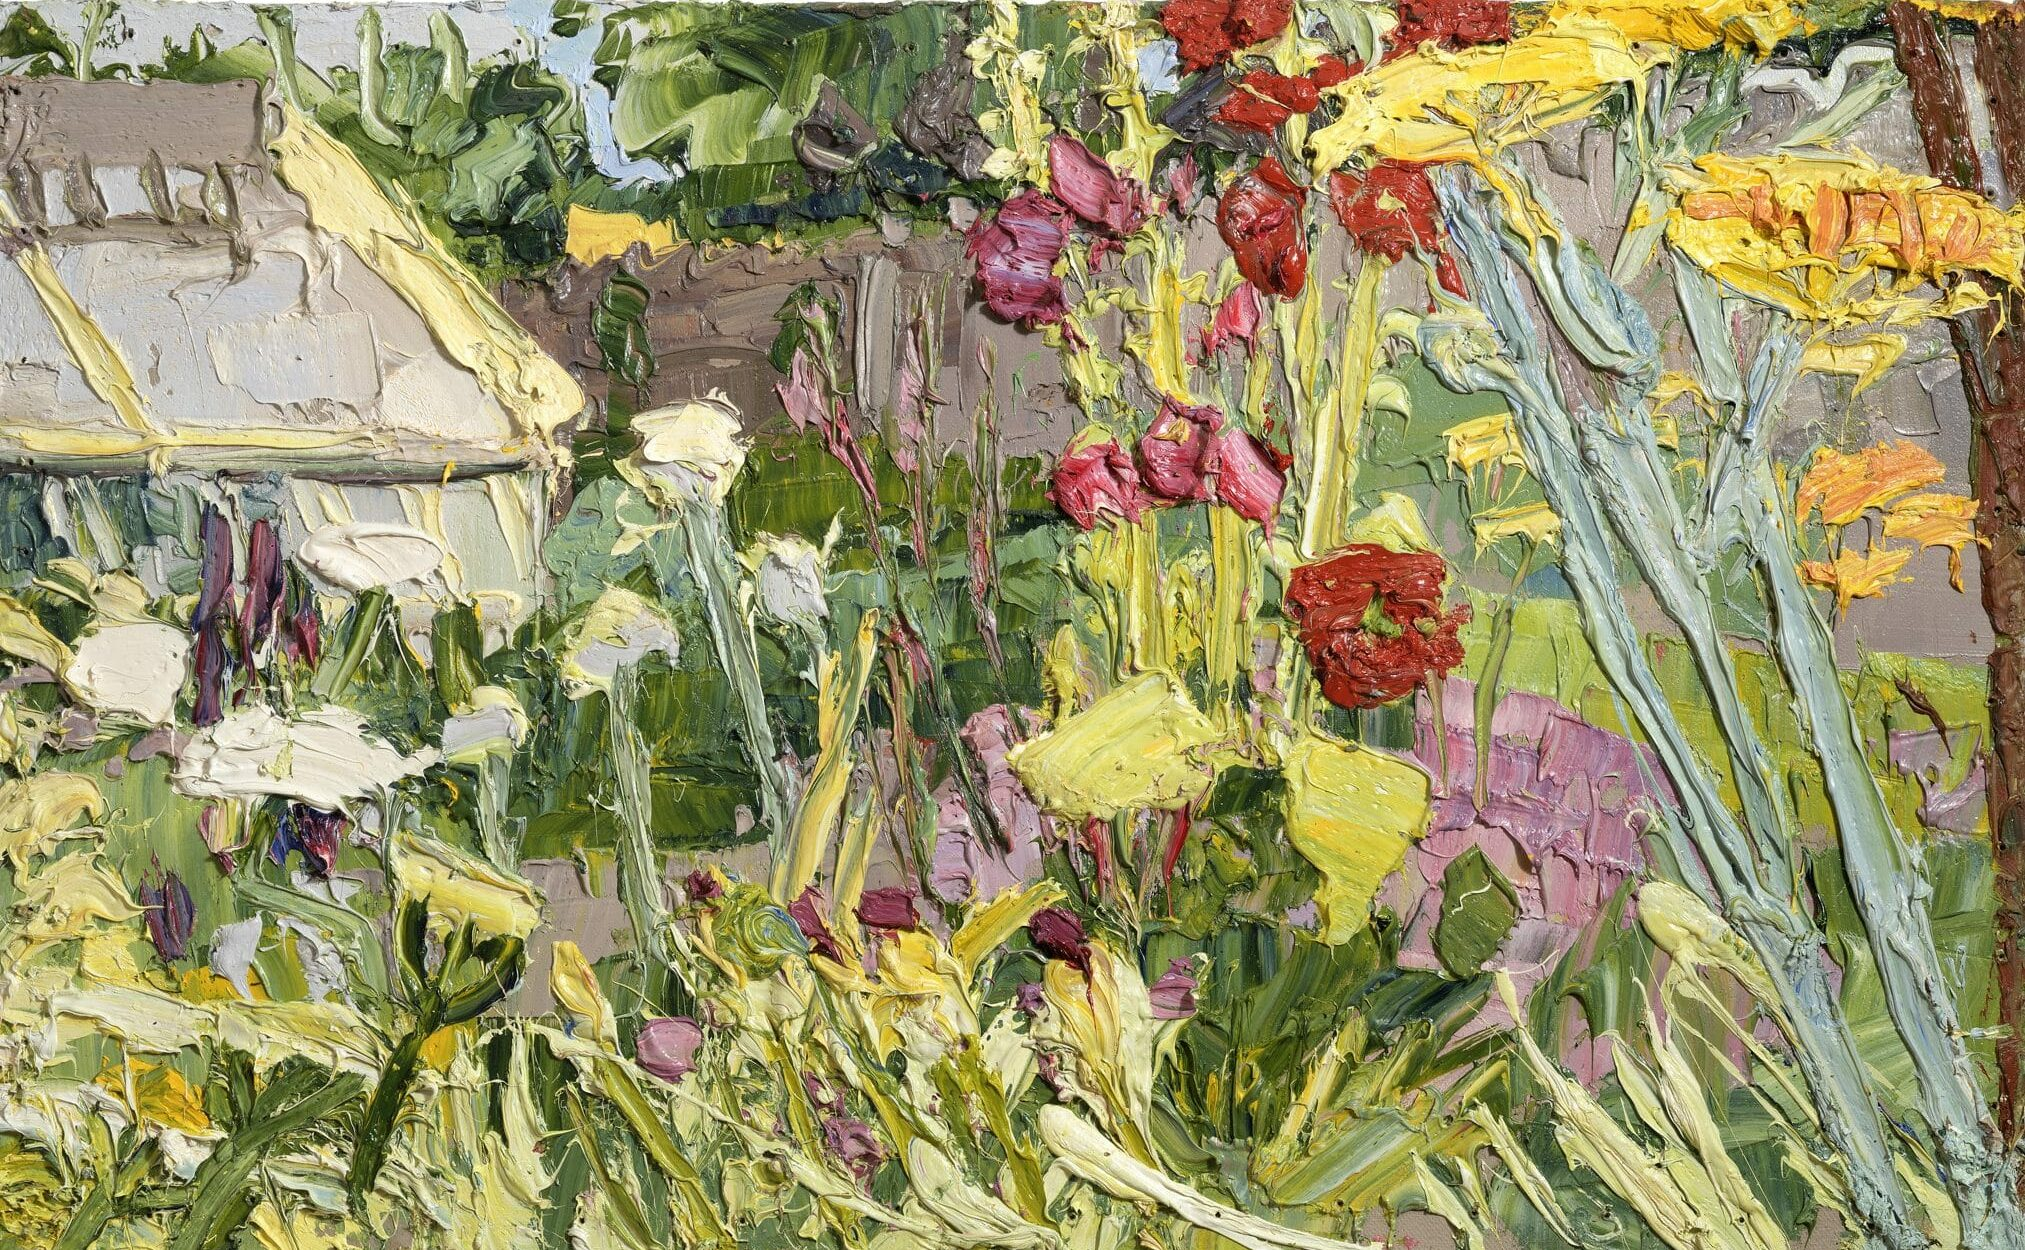 George Rowlett, Through Hollyhocks, Allium Stipitatum, Fennel, and Wild Carrot to the Greenhouse, 18-19 July 2018 © The Artist